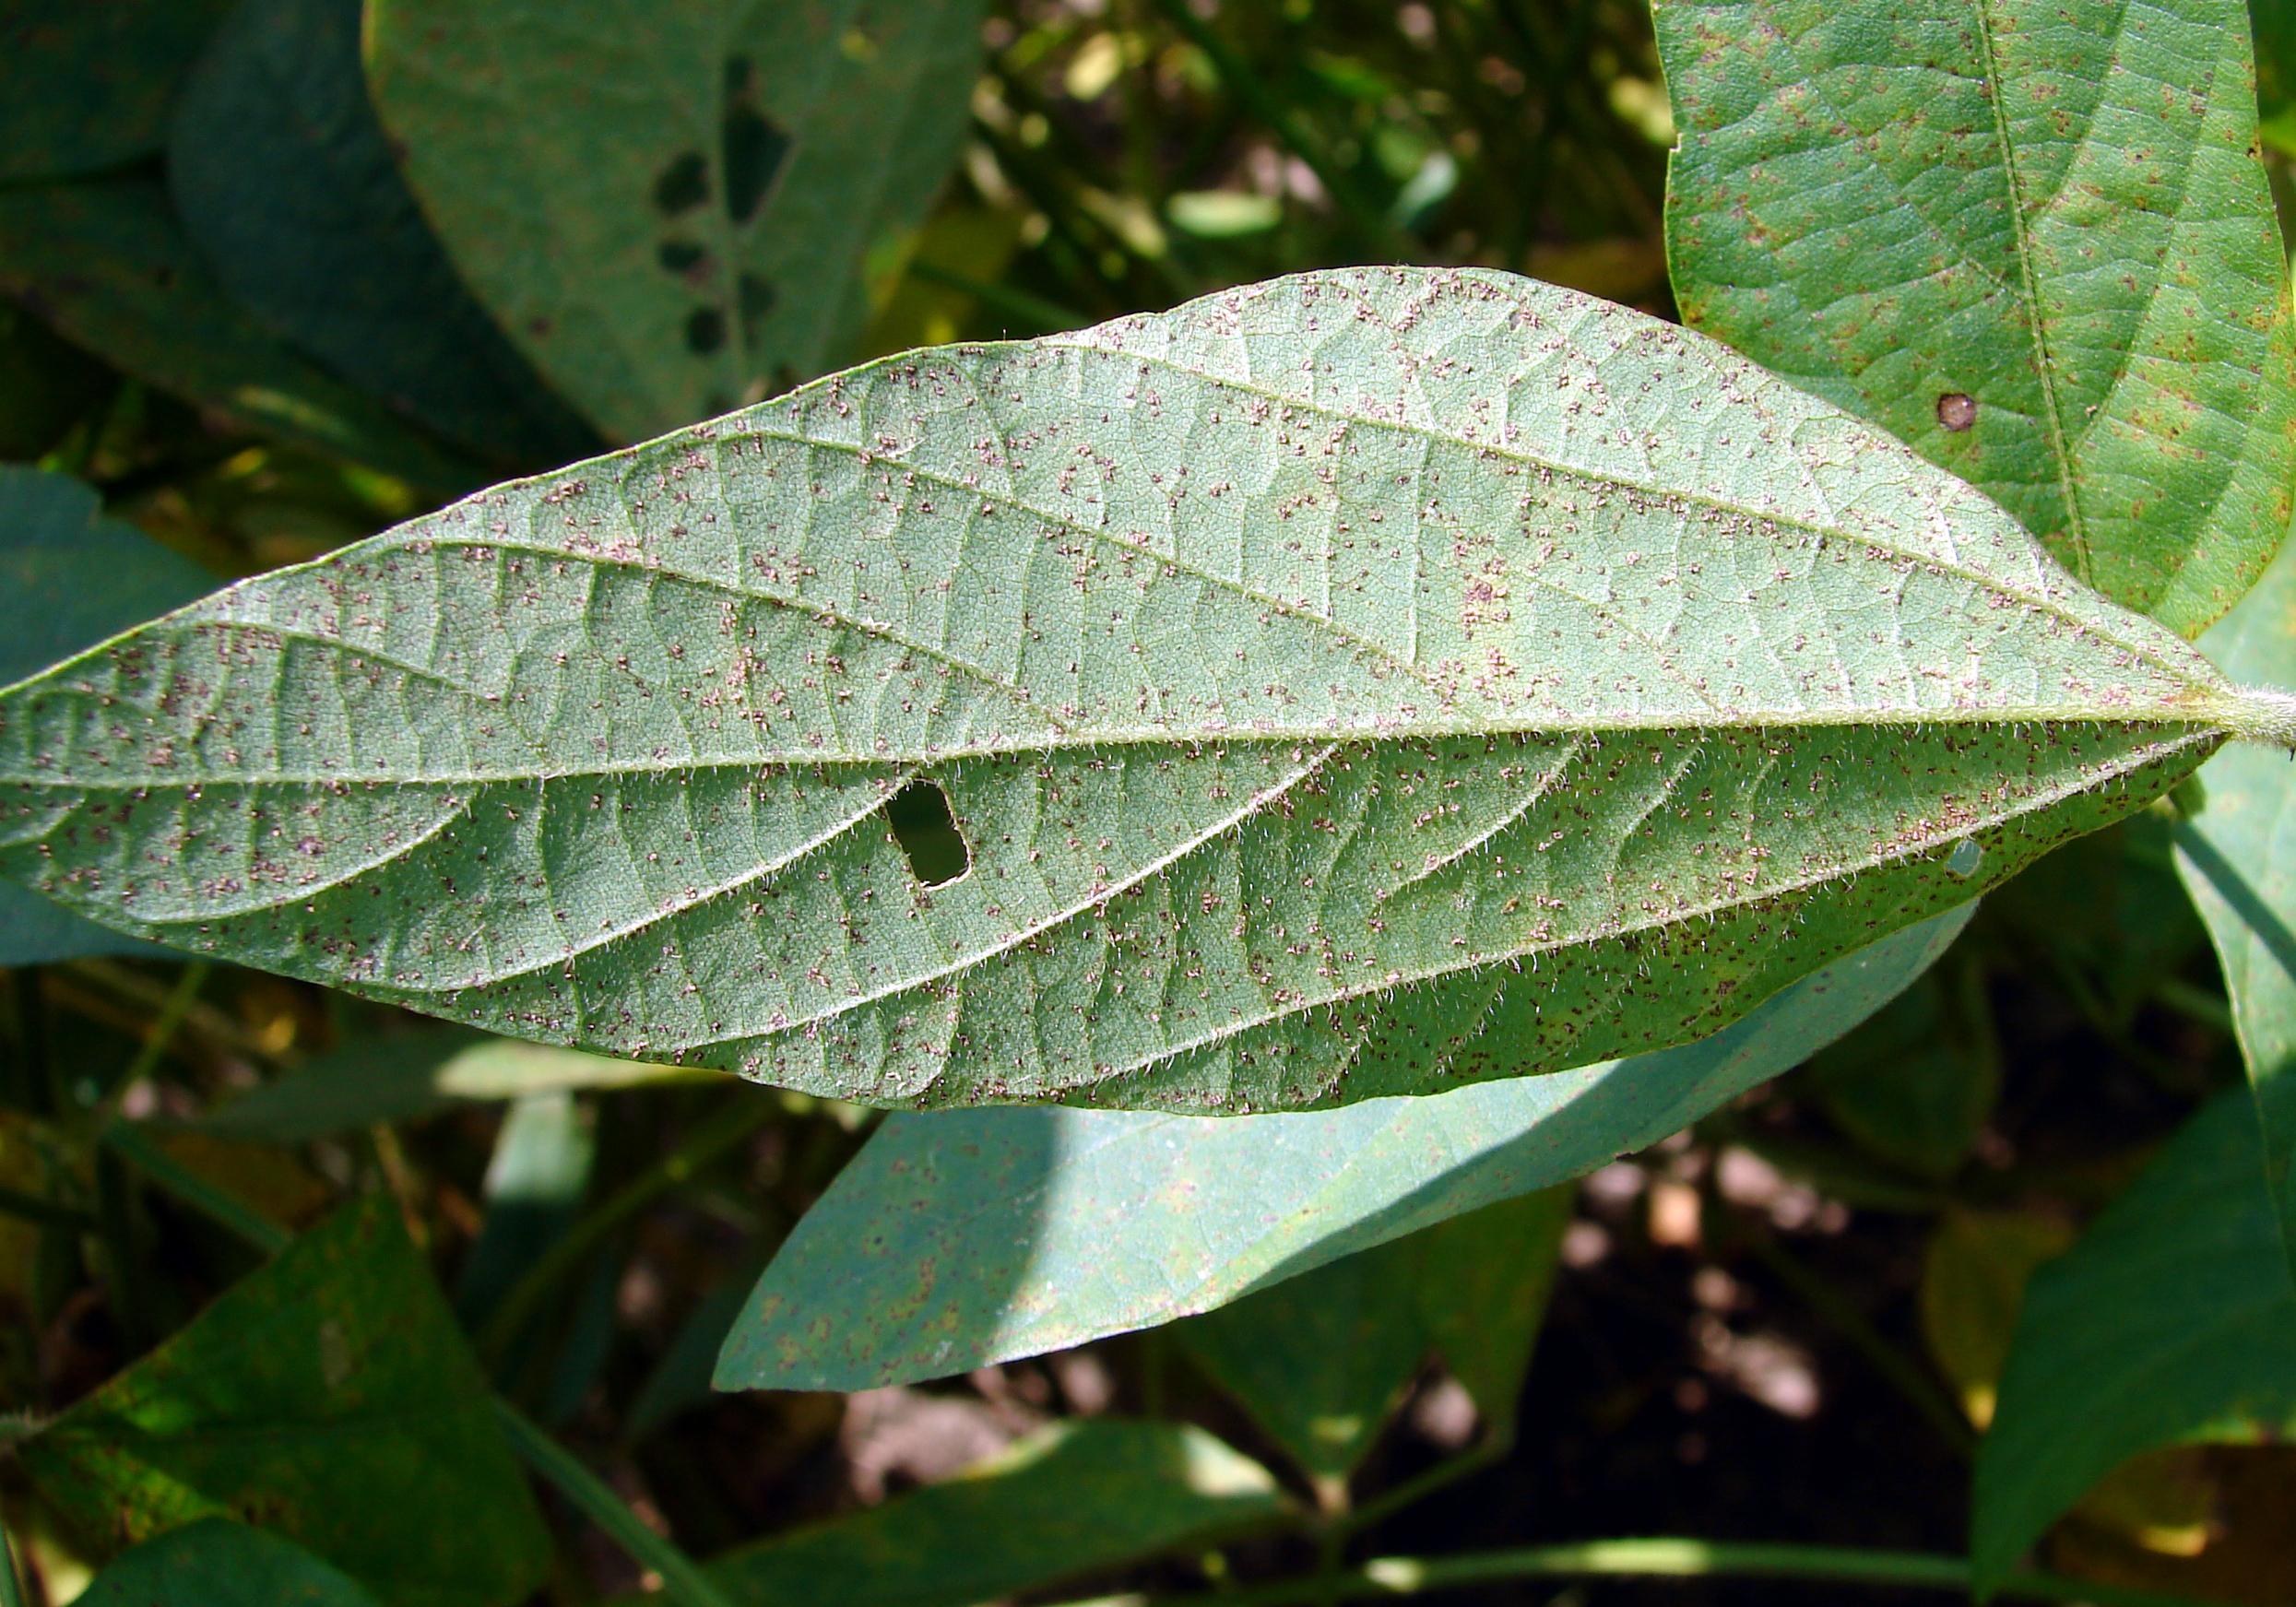 Leaf underside showing symptoms of soybean rust.